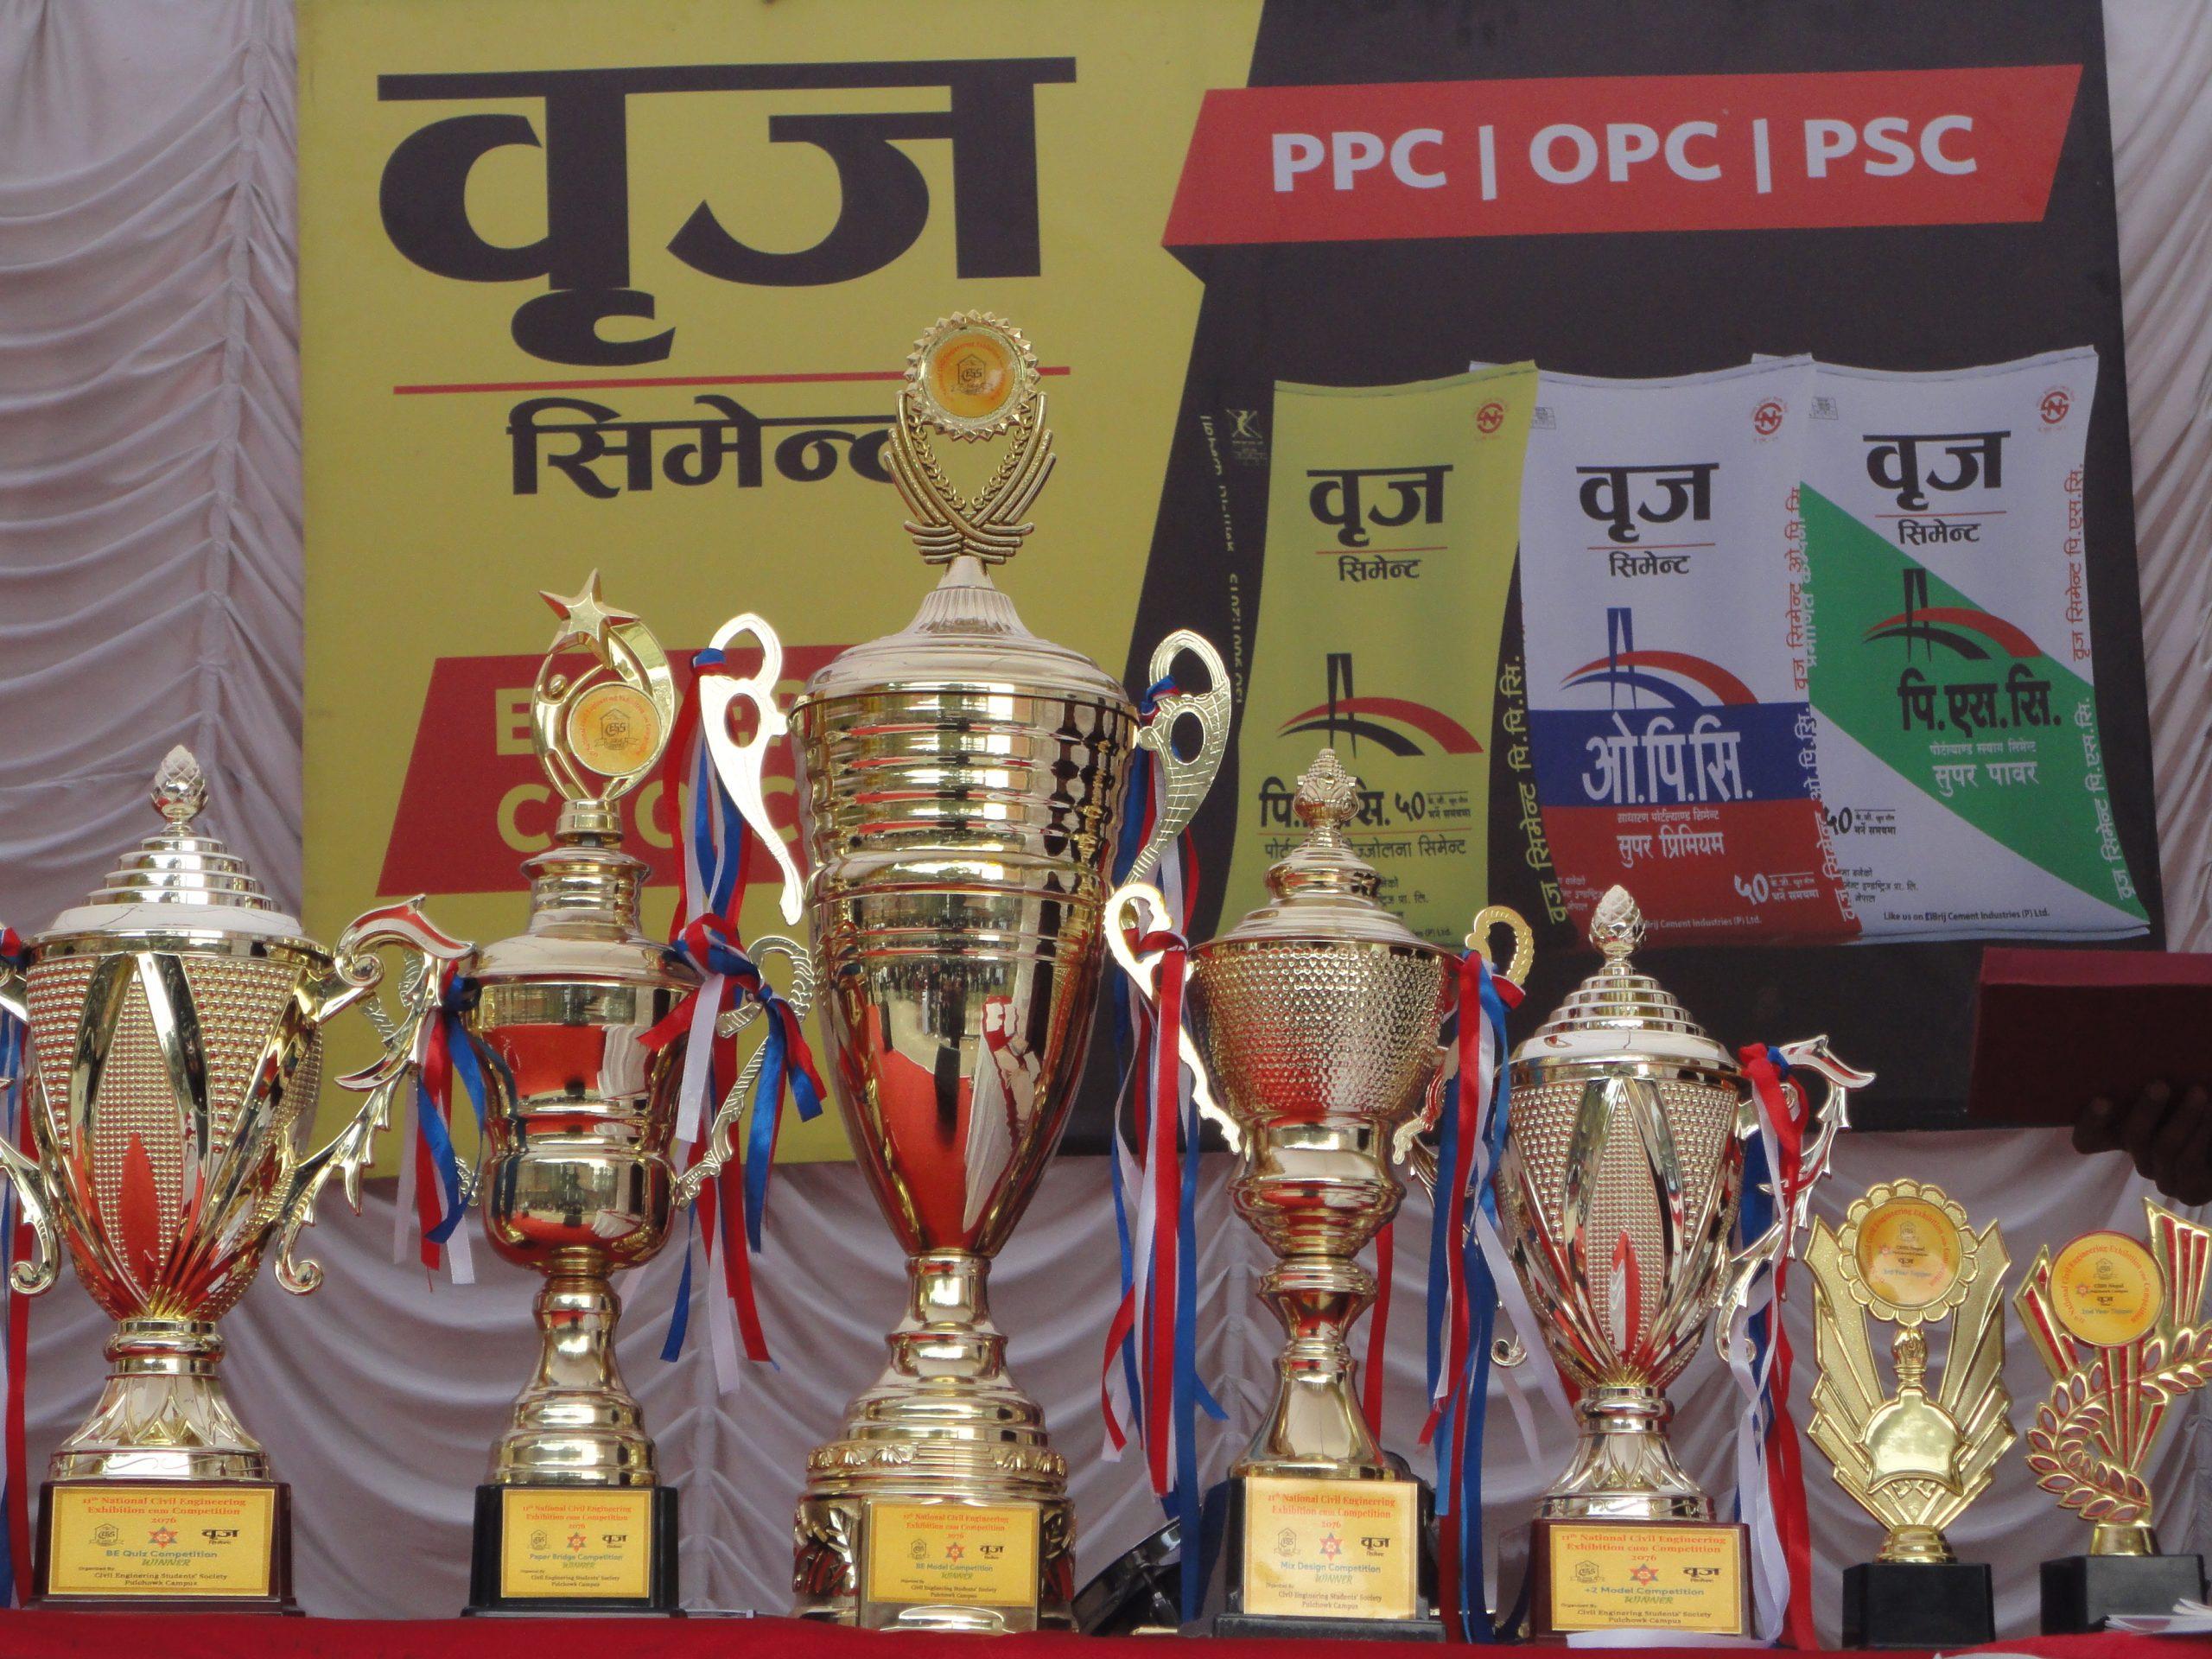 11th Civil Engineering Trophy Sponsorship